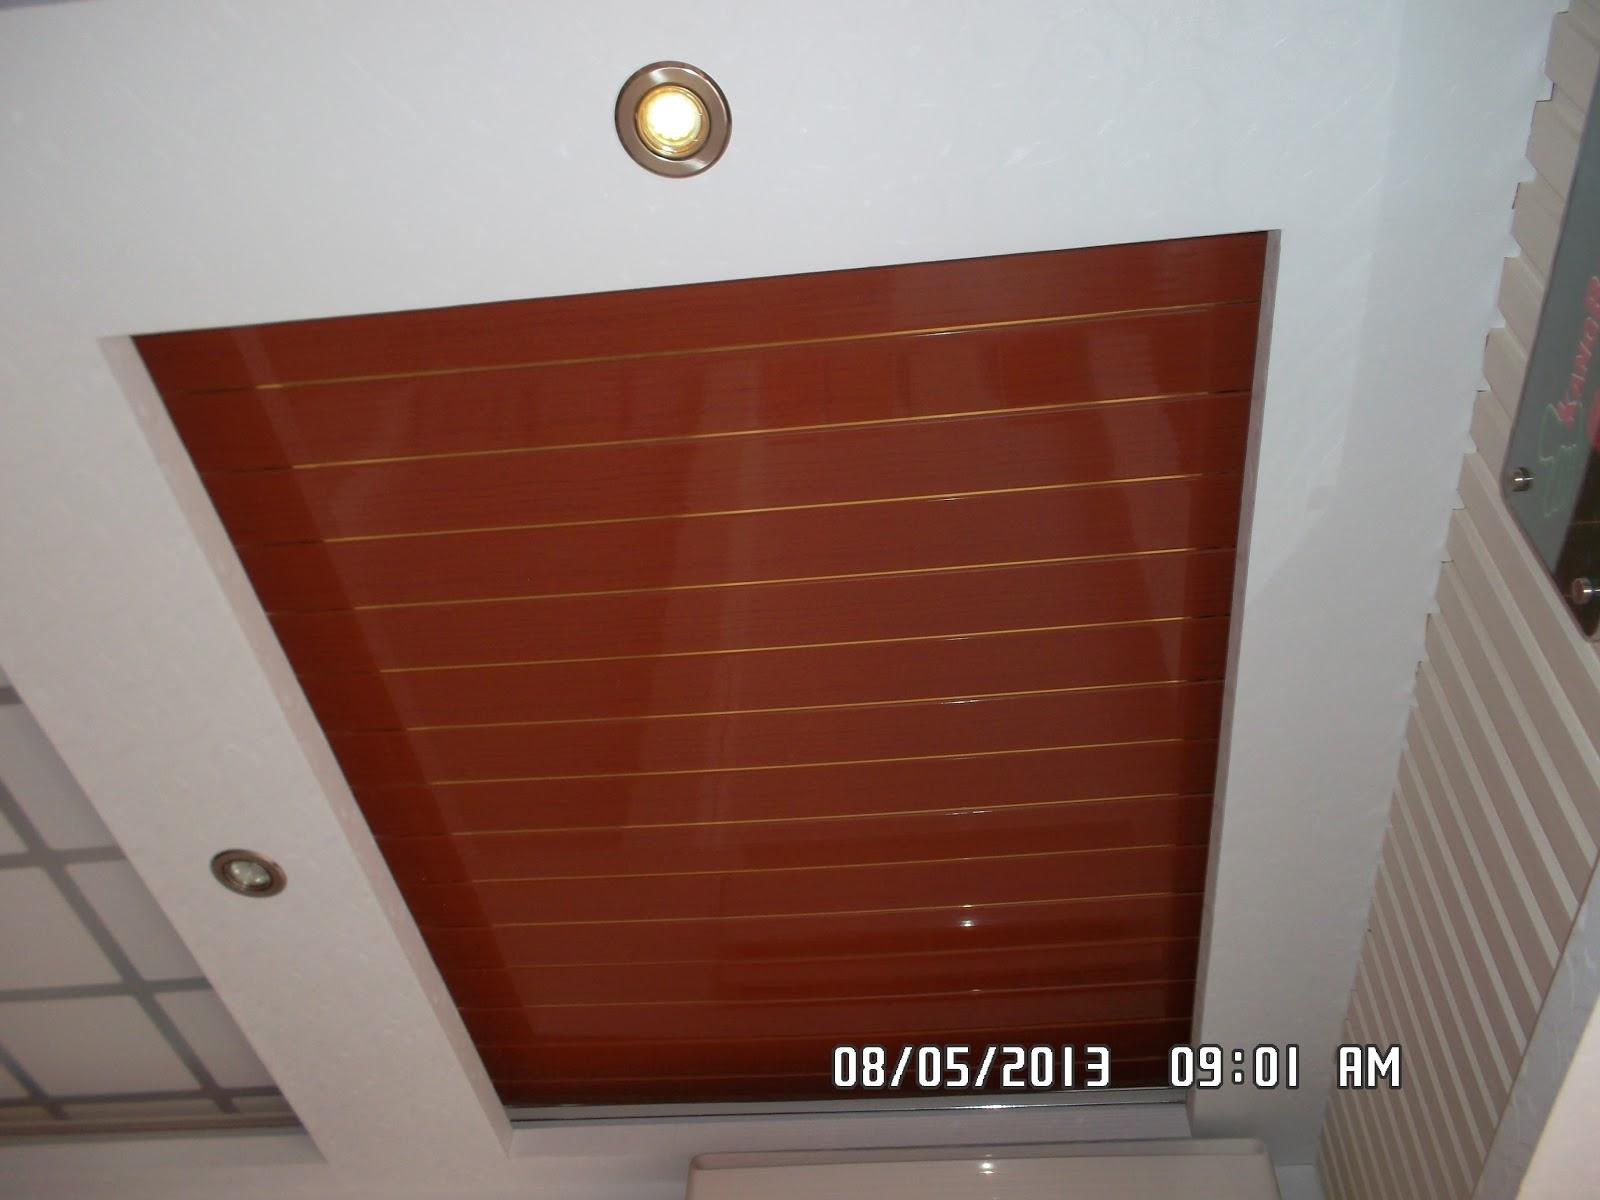 Kang Bang Lampung Plafon  PVC  Kang Bang Plavon PVC  motif